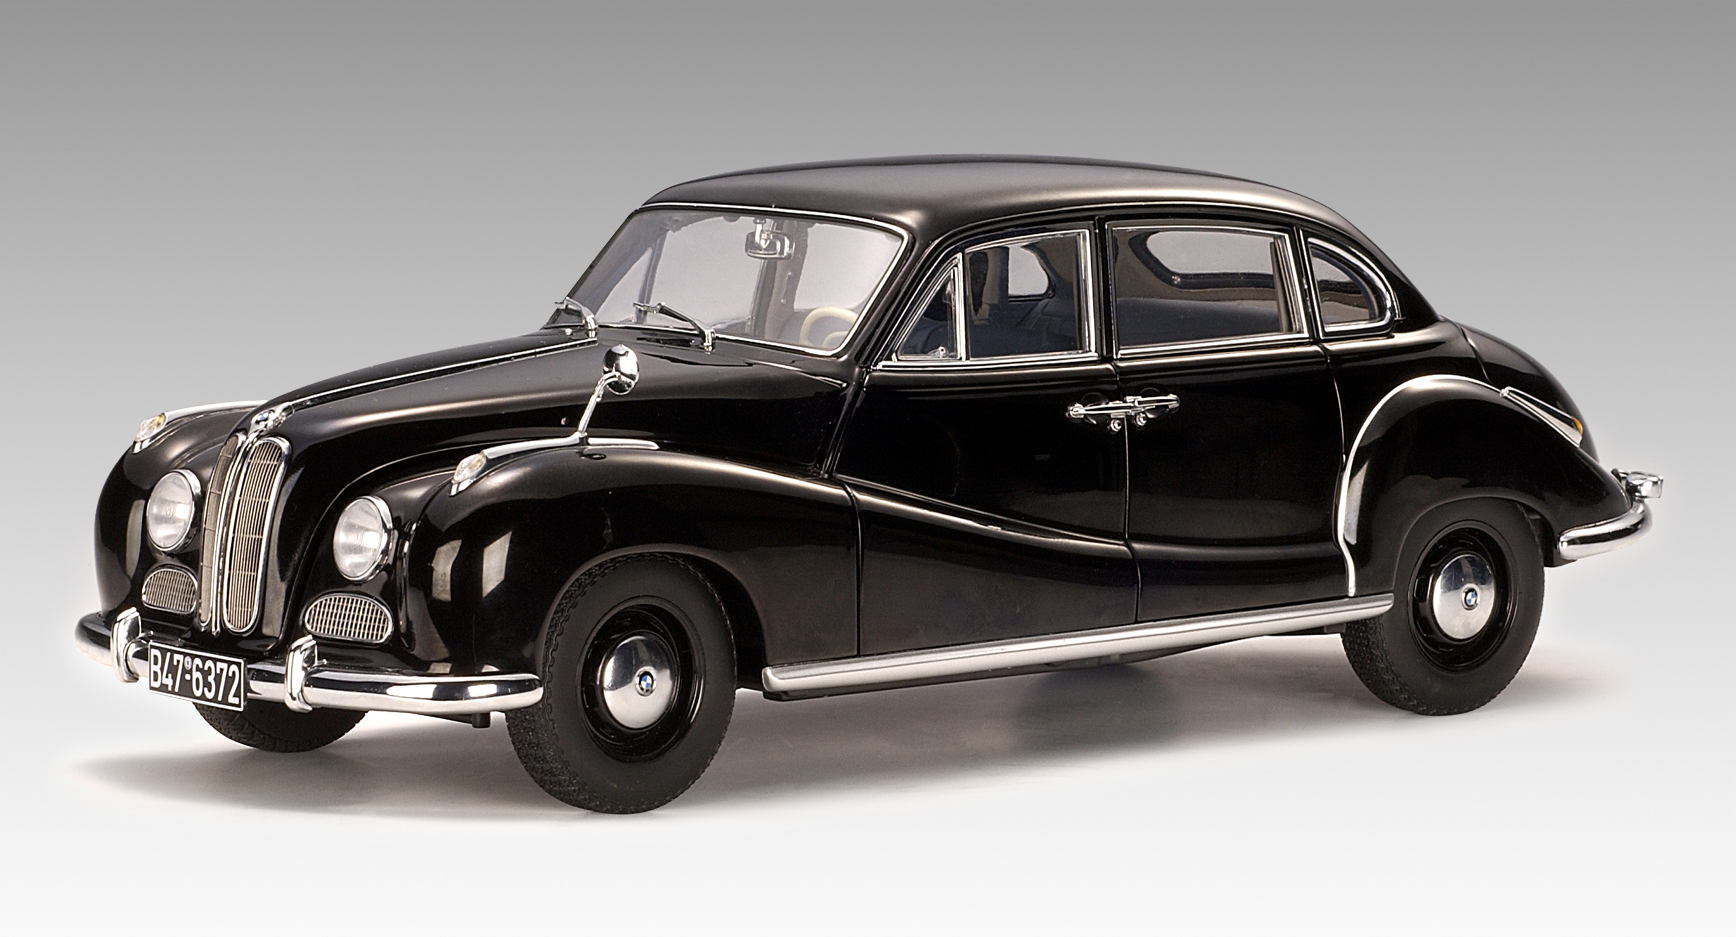 Autoart Bmw 501 Limousine 6 Cylinder Black 70602 In 1